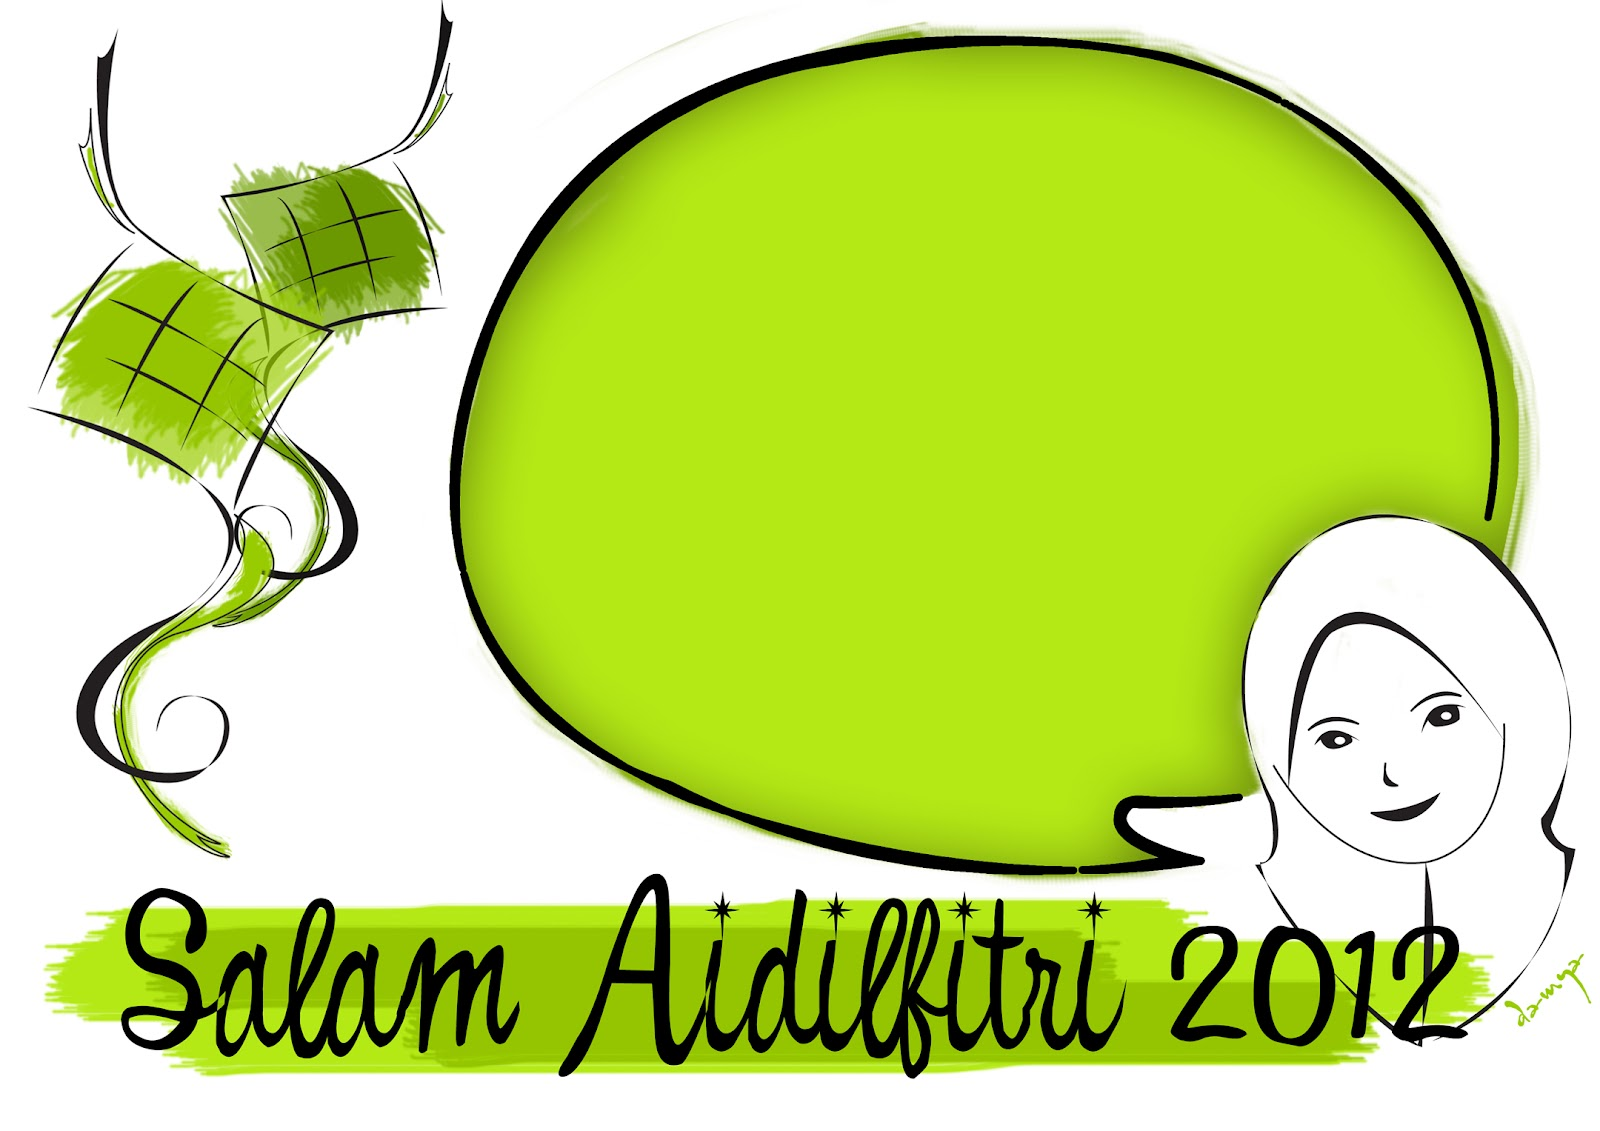 Design Templates : Kad Raya Aidilfitri 2012 (Kartun)